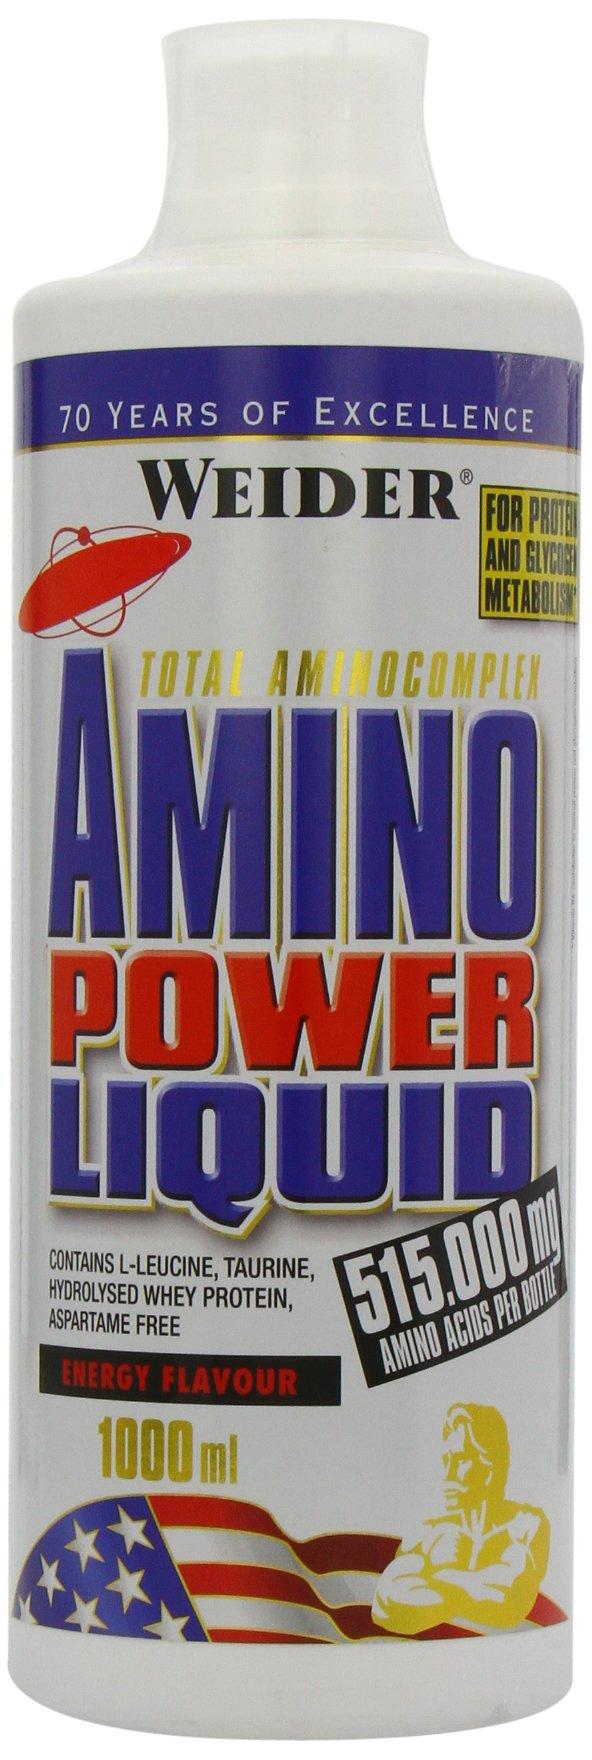 71 OSJVfzxL - Weider Amino Power Liquid 1L Energy, Essential Amino Acids, L-leucine, Free Taurine, Vitamin B8